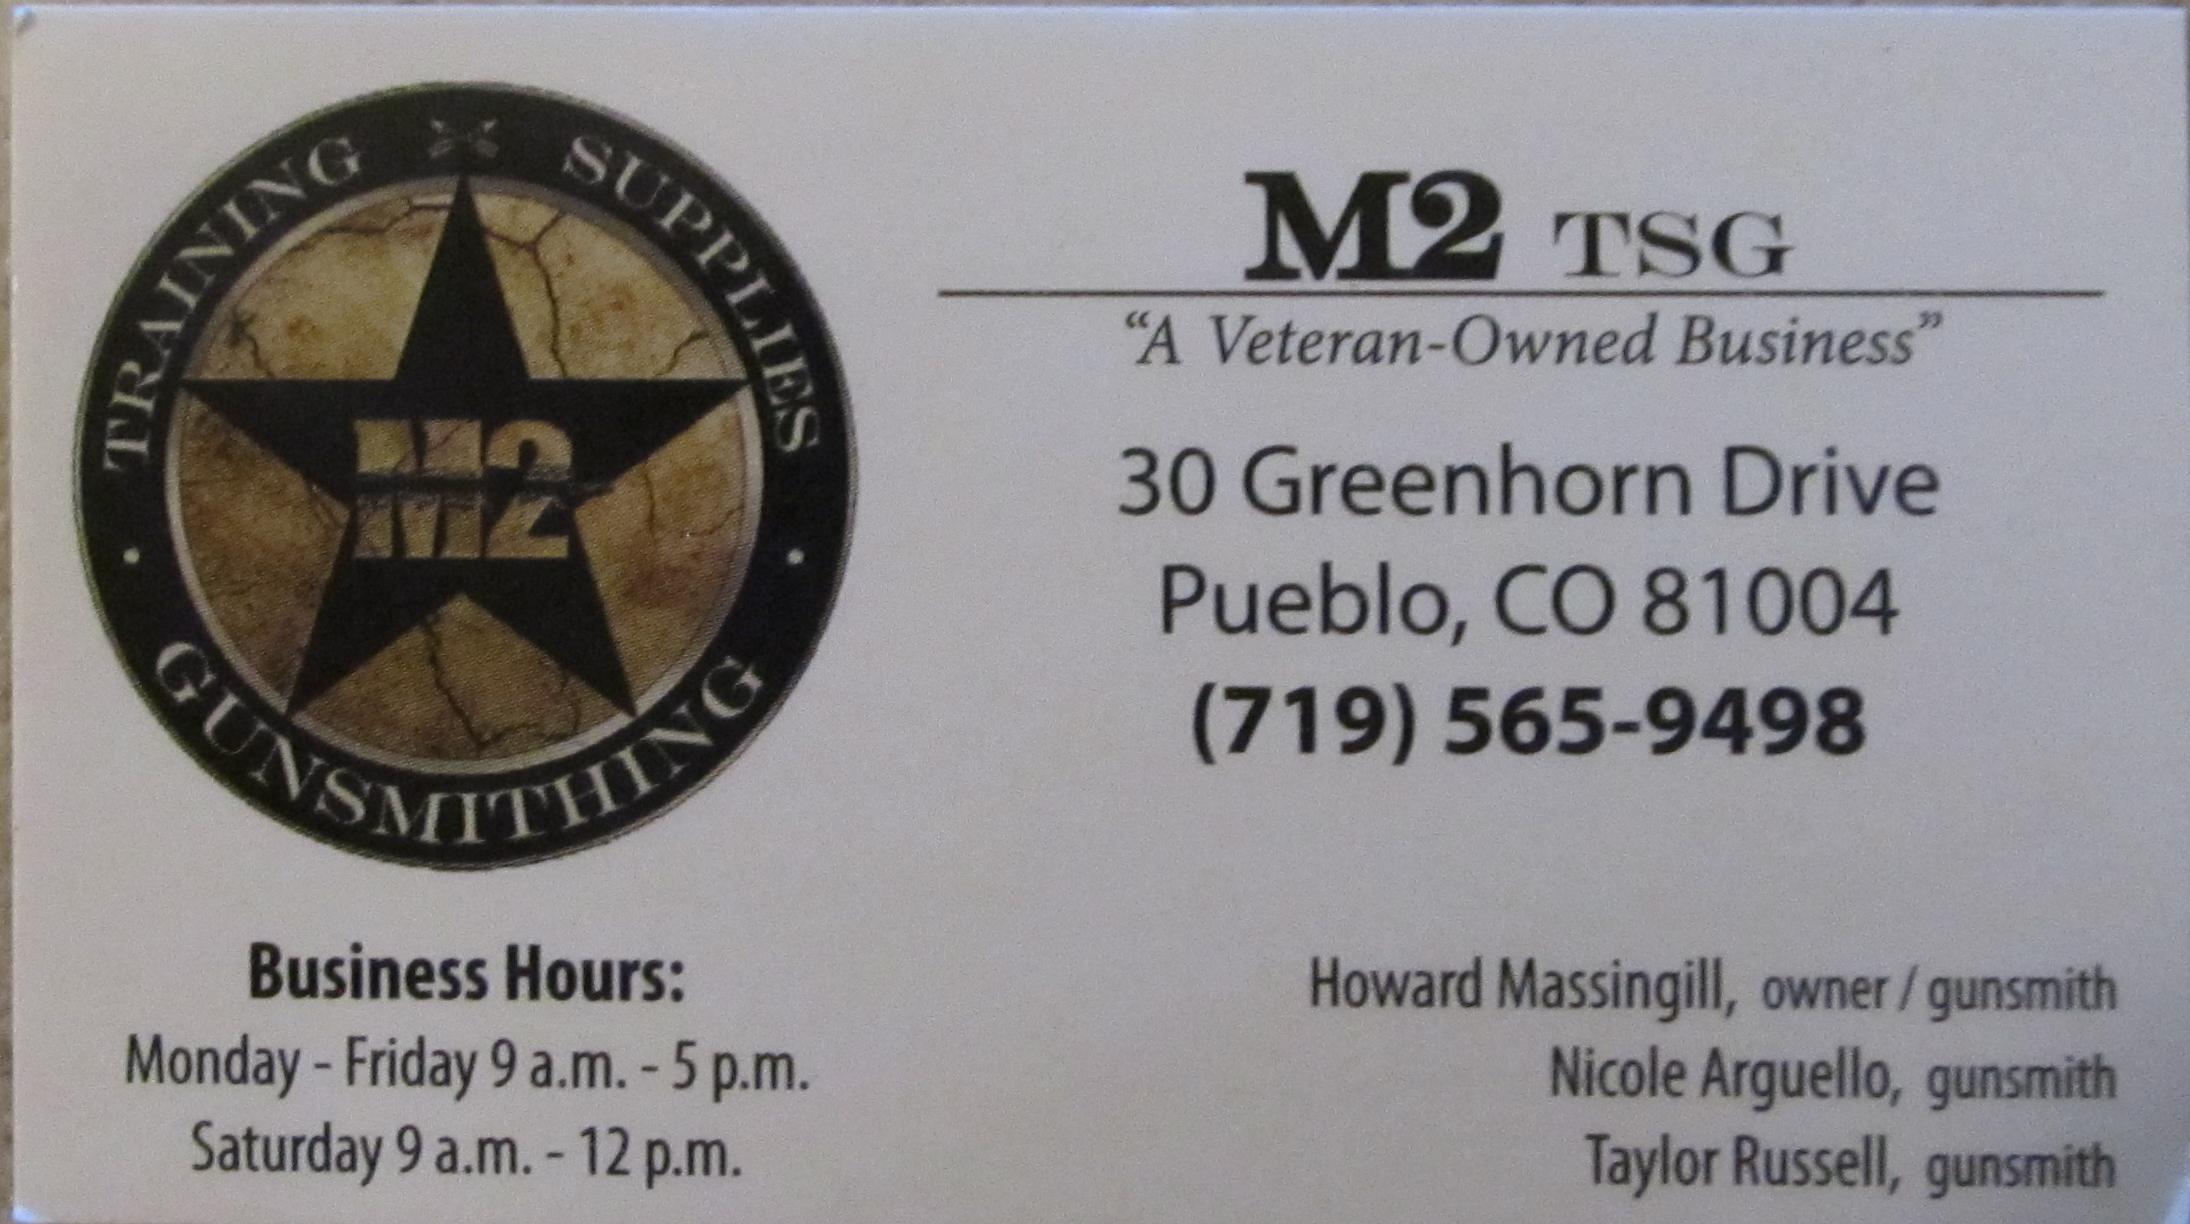 M2 Tsg Shoot Straight Puebloshoot Straight Pueblo